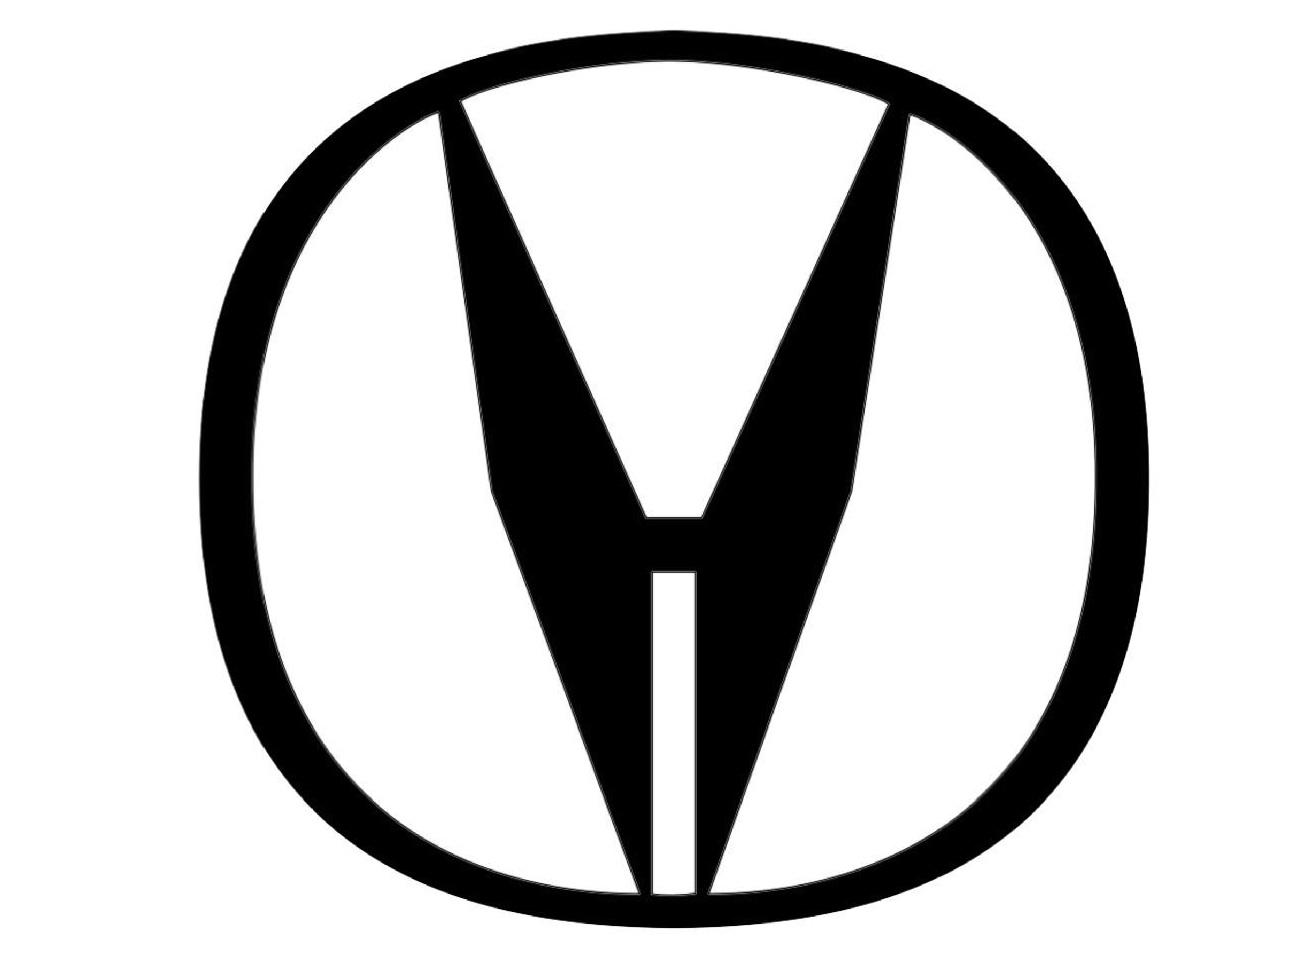 premier all logos acura logo rh premieralllogos blogspot com